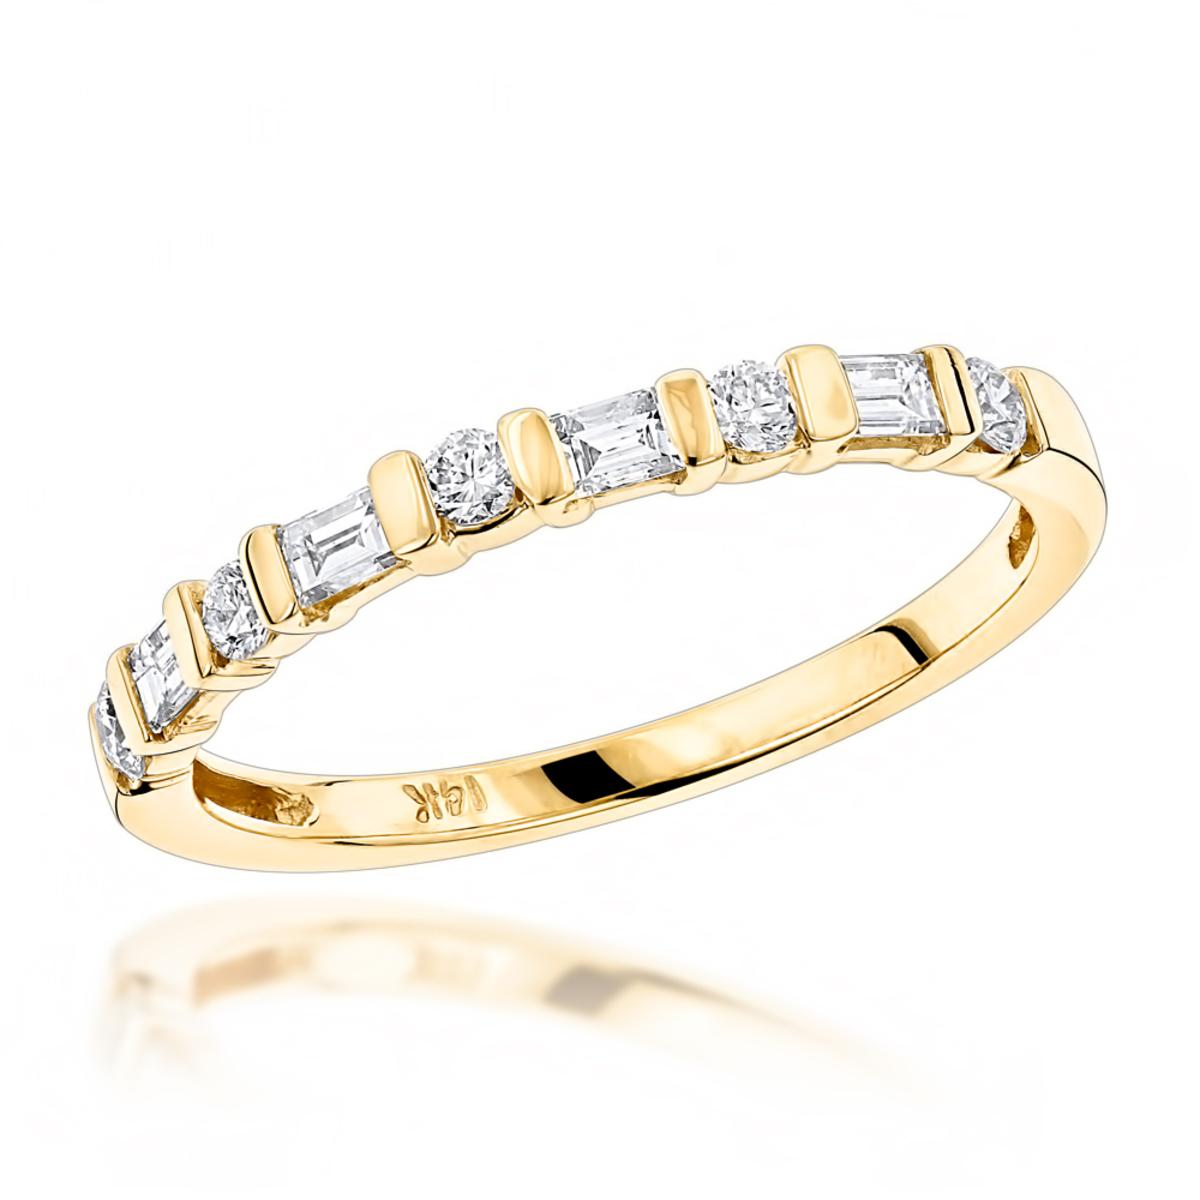 Anniversary Rings 14K Gold Baguette Round Diamond Womens Wedding Band 0.4ct